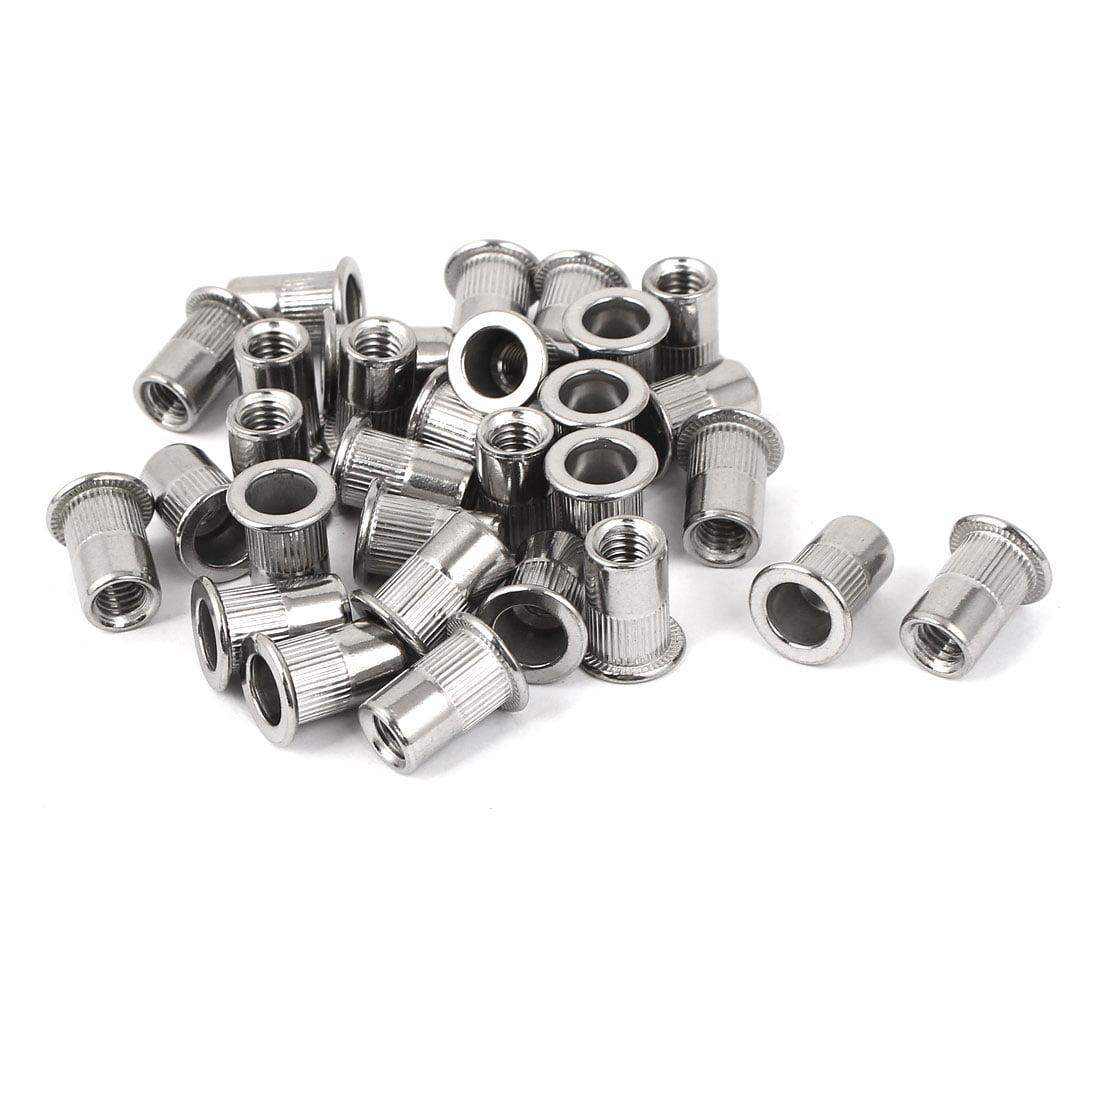 Uxcell M6 Stainless Steel Flat Head Rivet Nut  Insert Nutsert Silver Tone (30-pack)